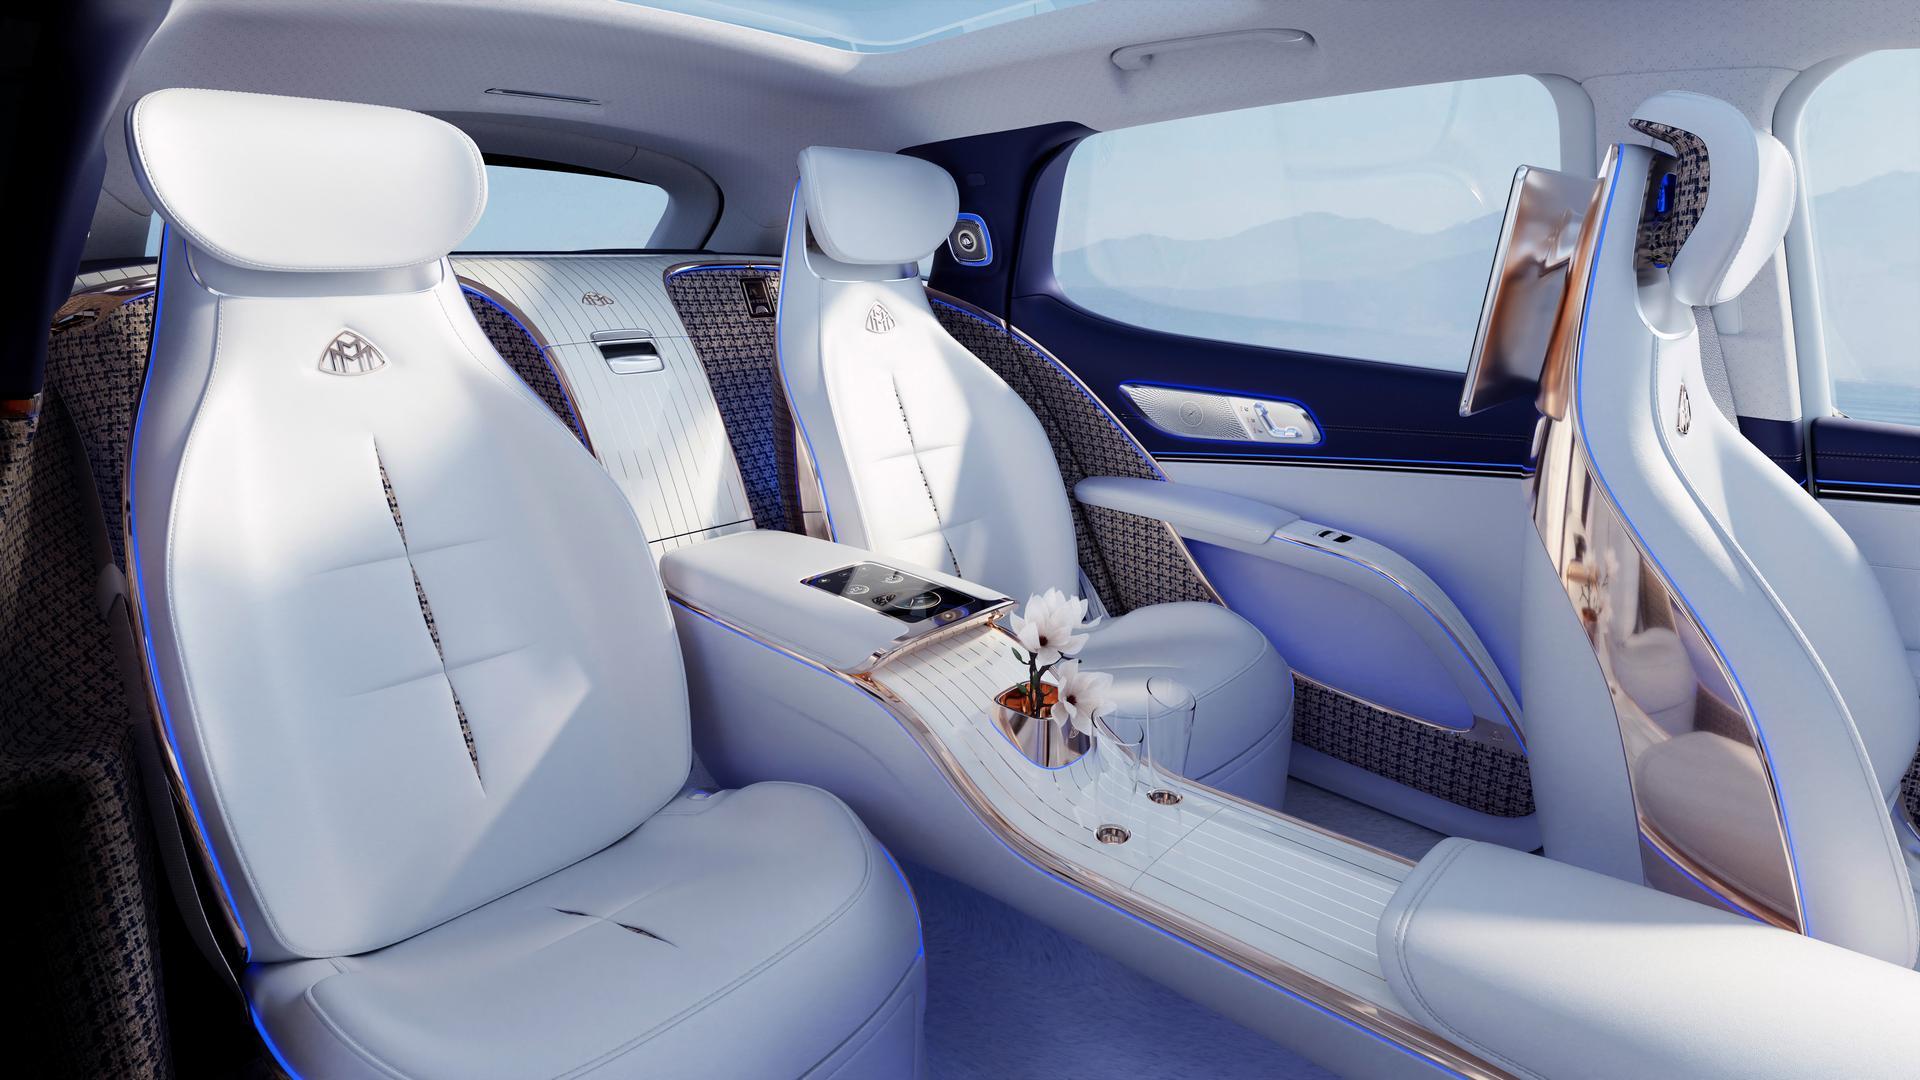 Mercedes-Maybach EQS SUV seats